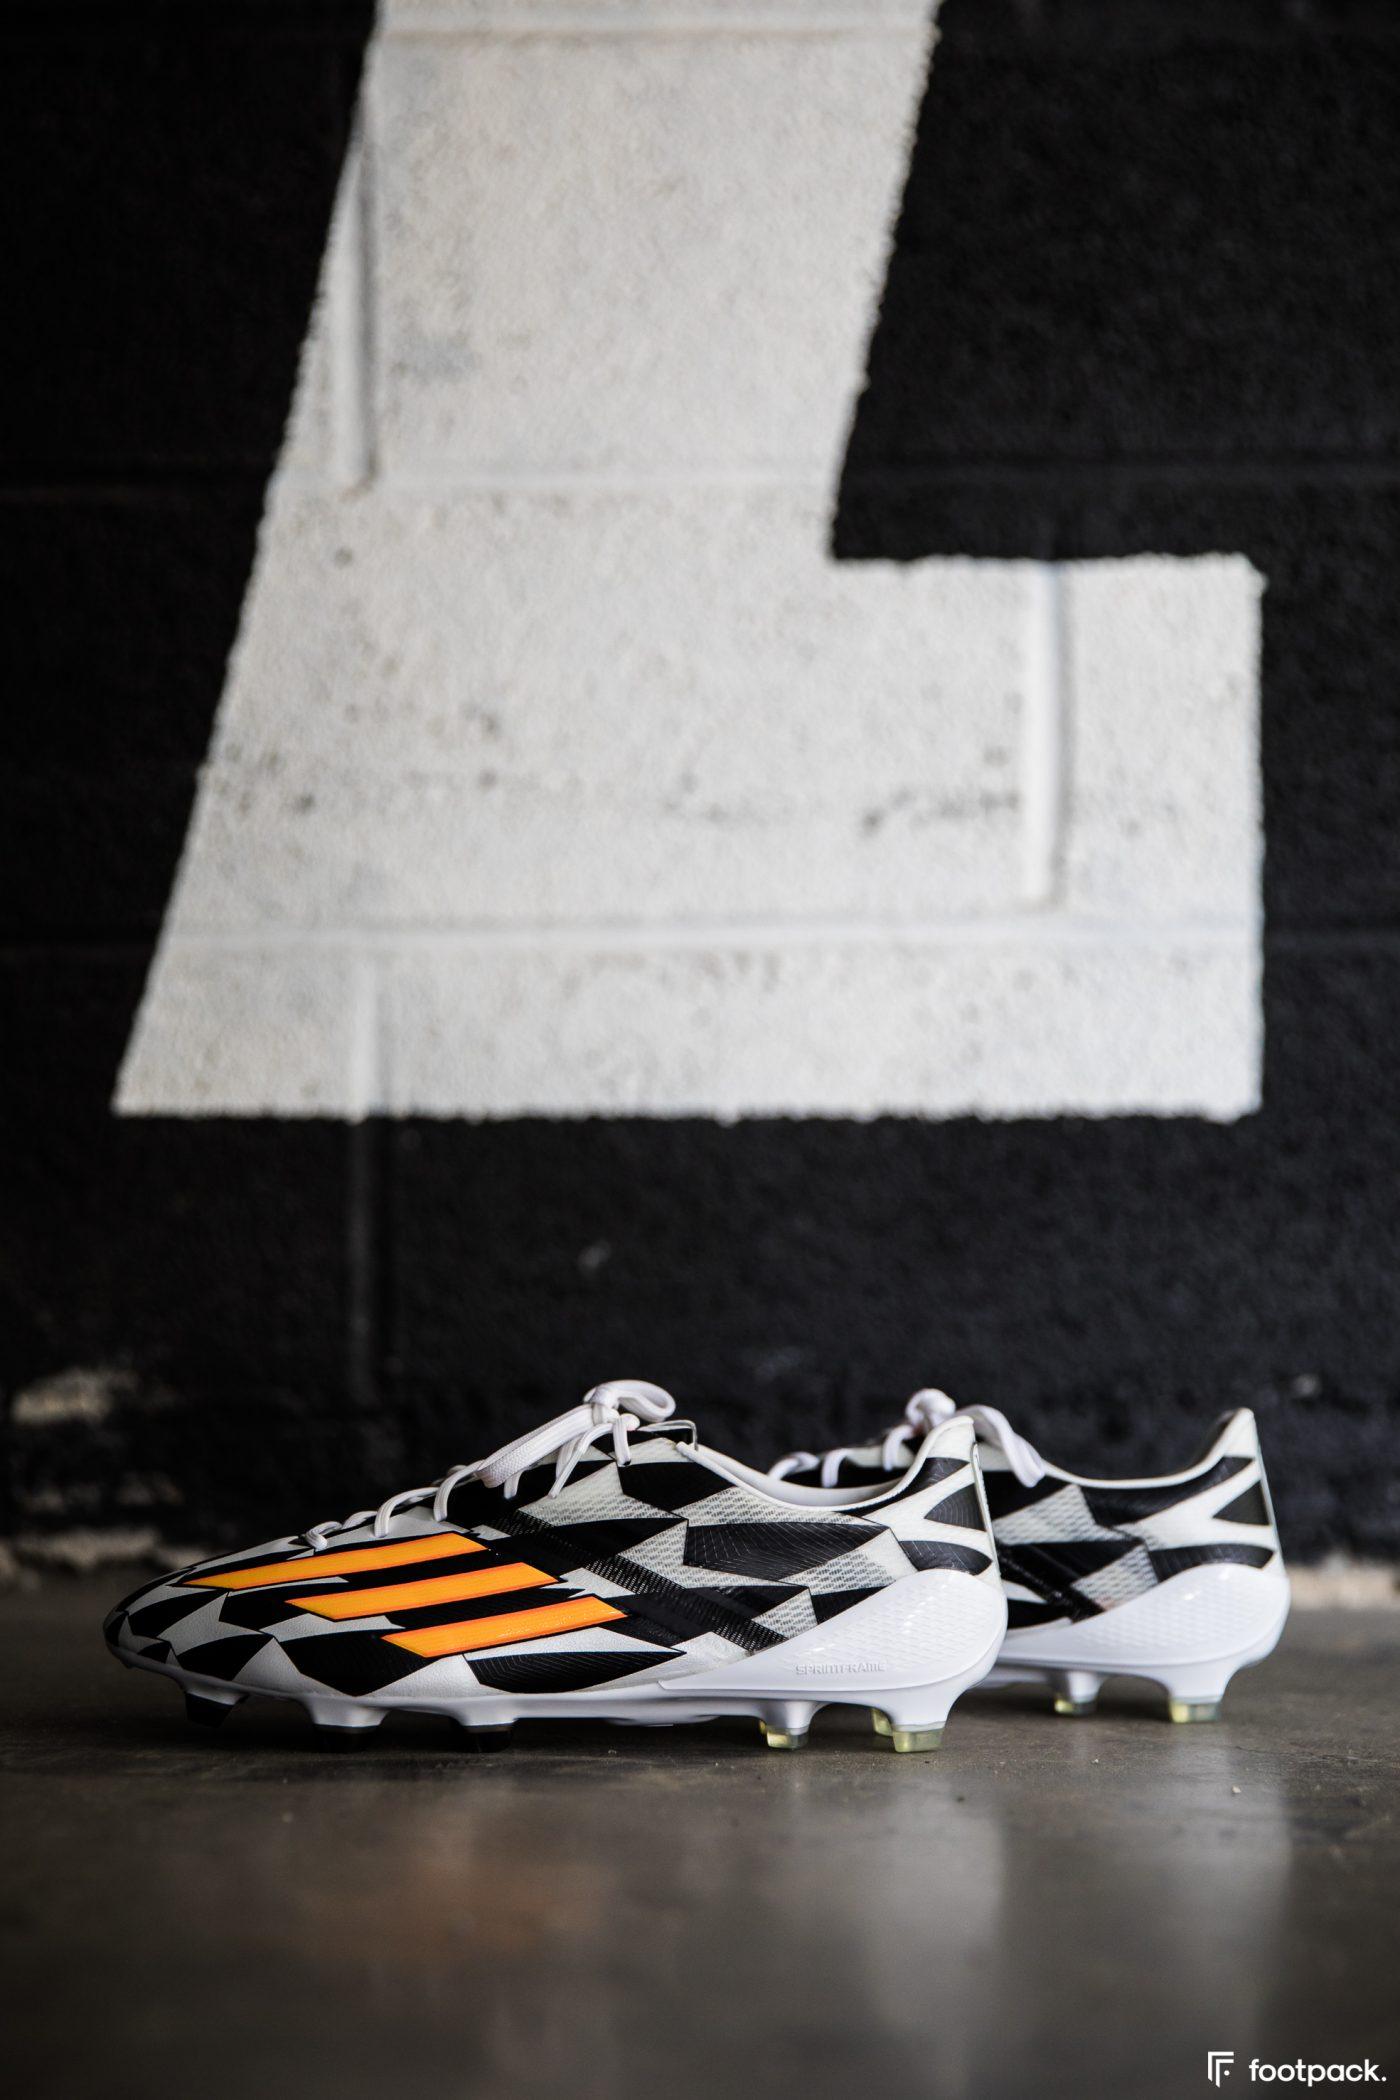 adidas-F50-adizero-battle-pack-coupe-du-monde-2014-footpack-2